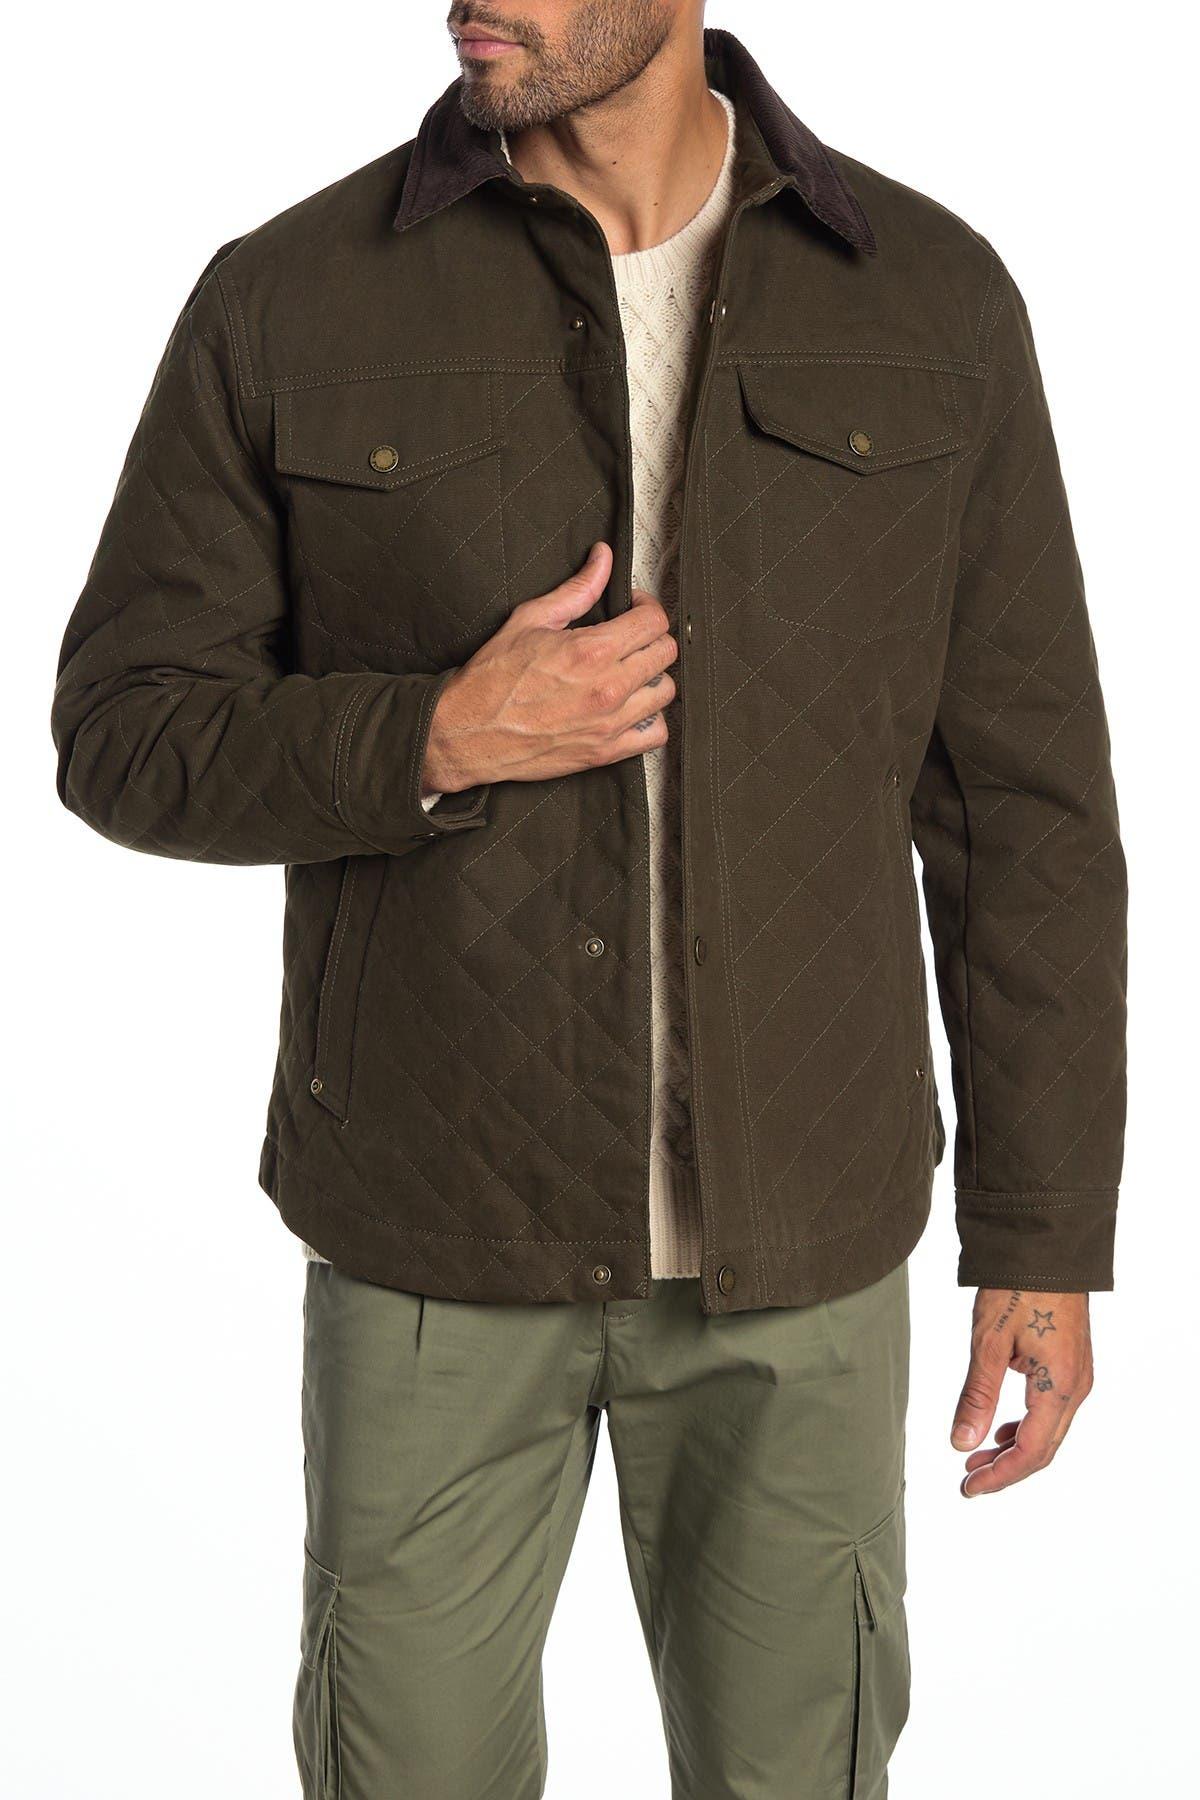 Image of PENDLETON Bannack Quilted Canvas Utility Jacket